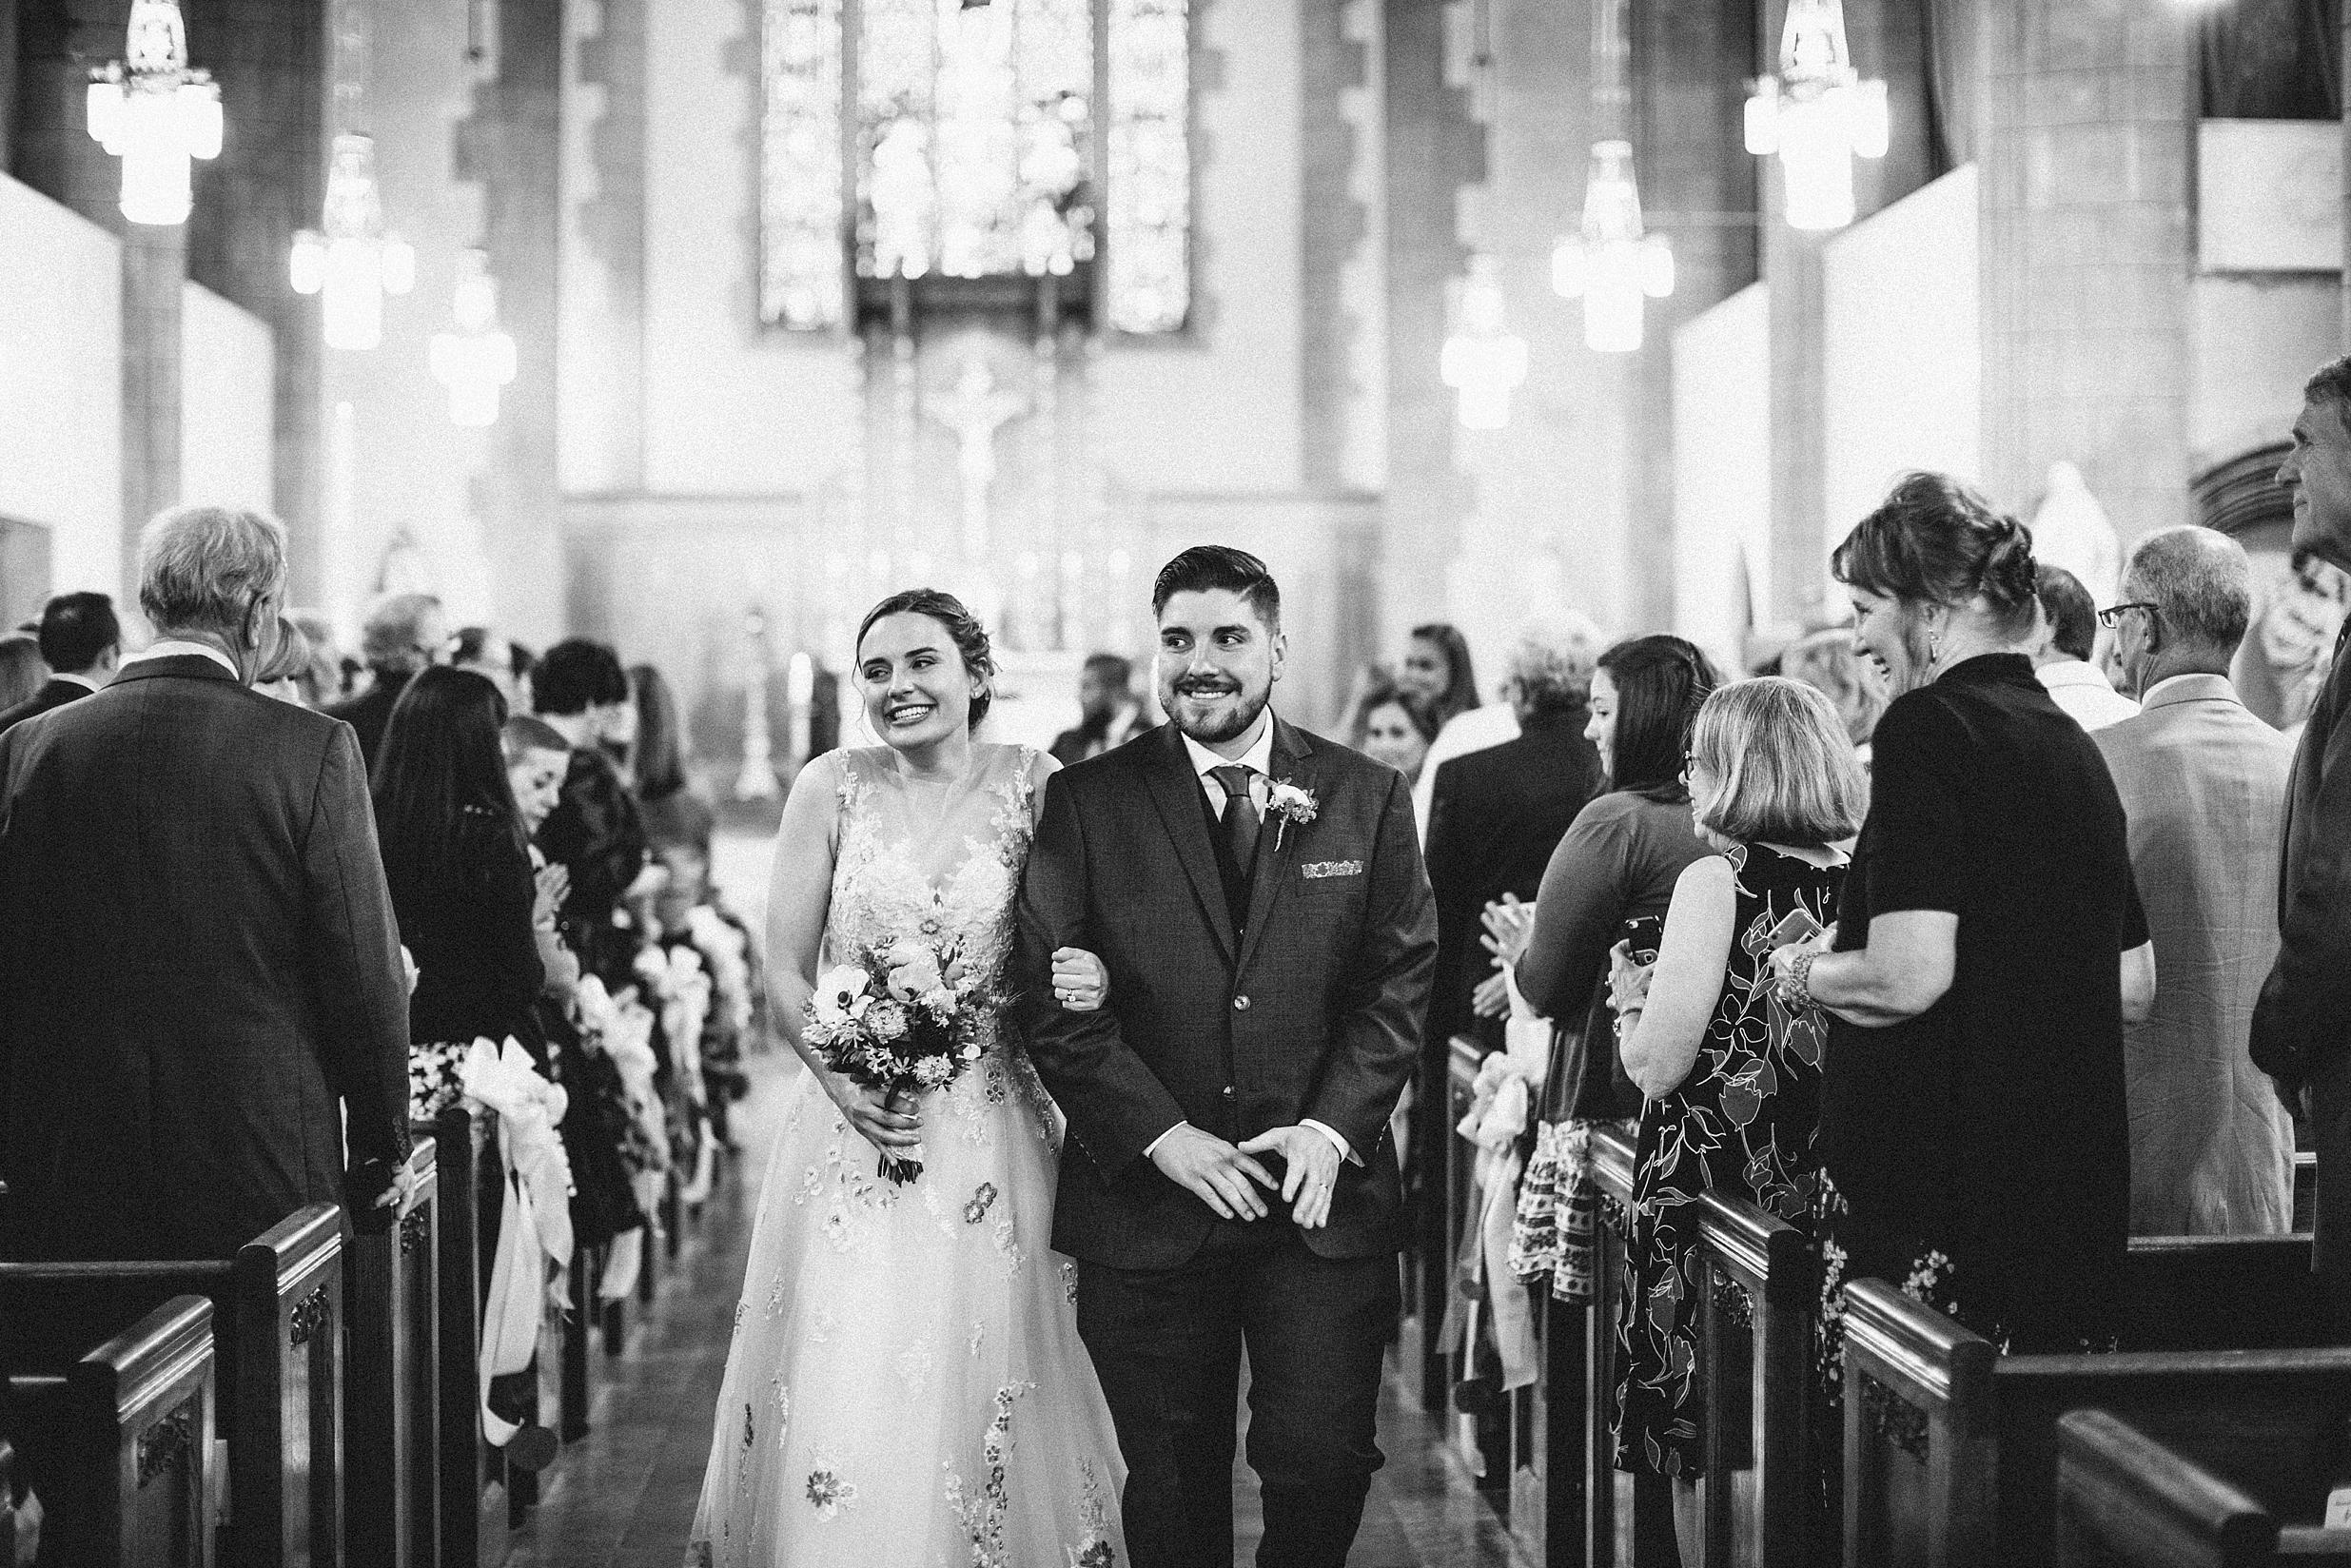 historic-upstate-ny-wedding-church-backyard-photographer_0021.jpg